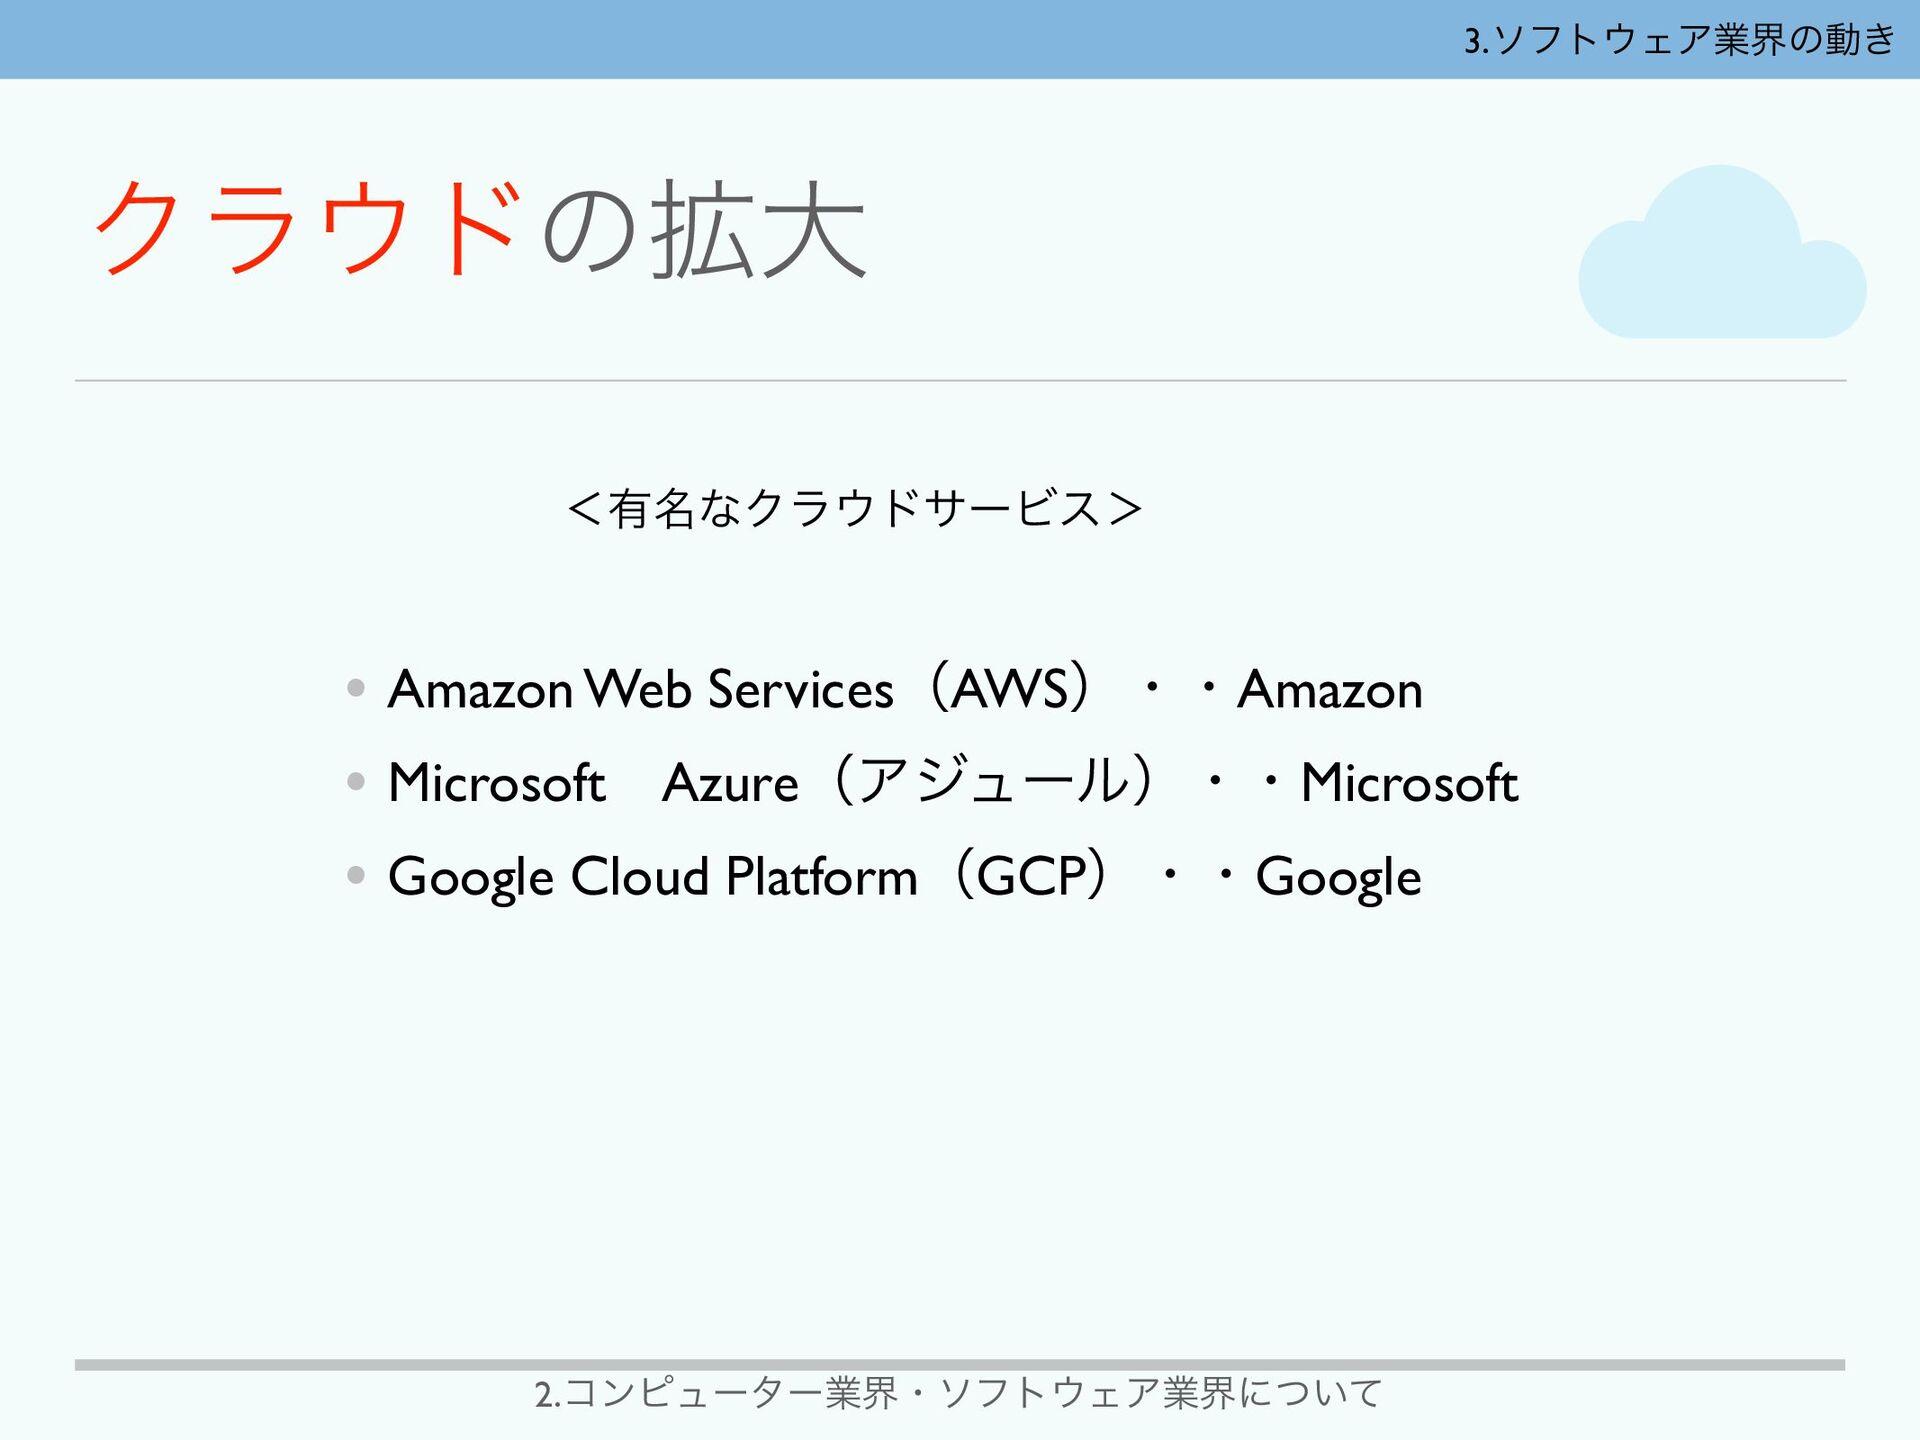 2.ίϯϐϡʔλʔۀքɾιϑτΣΞۀքʹ͍ͭͯ ʻ༗໊ͳΫϥυαʔϏε' • Amazon...